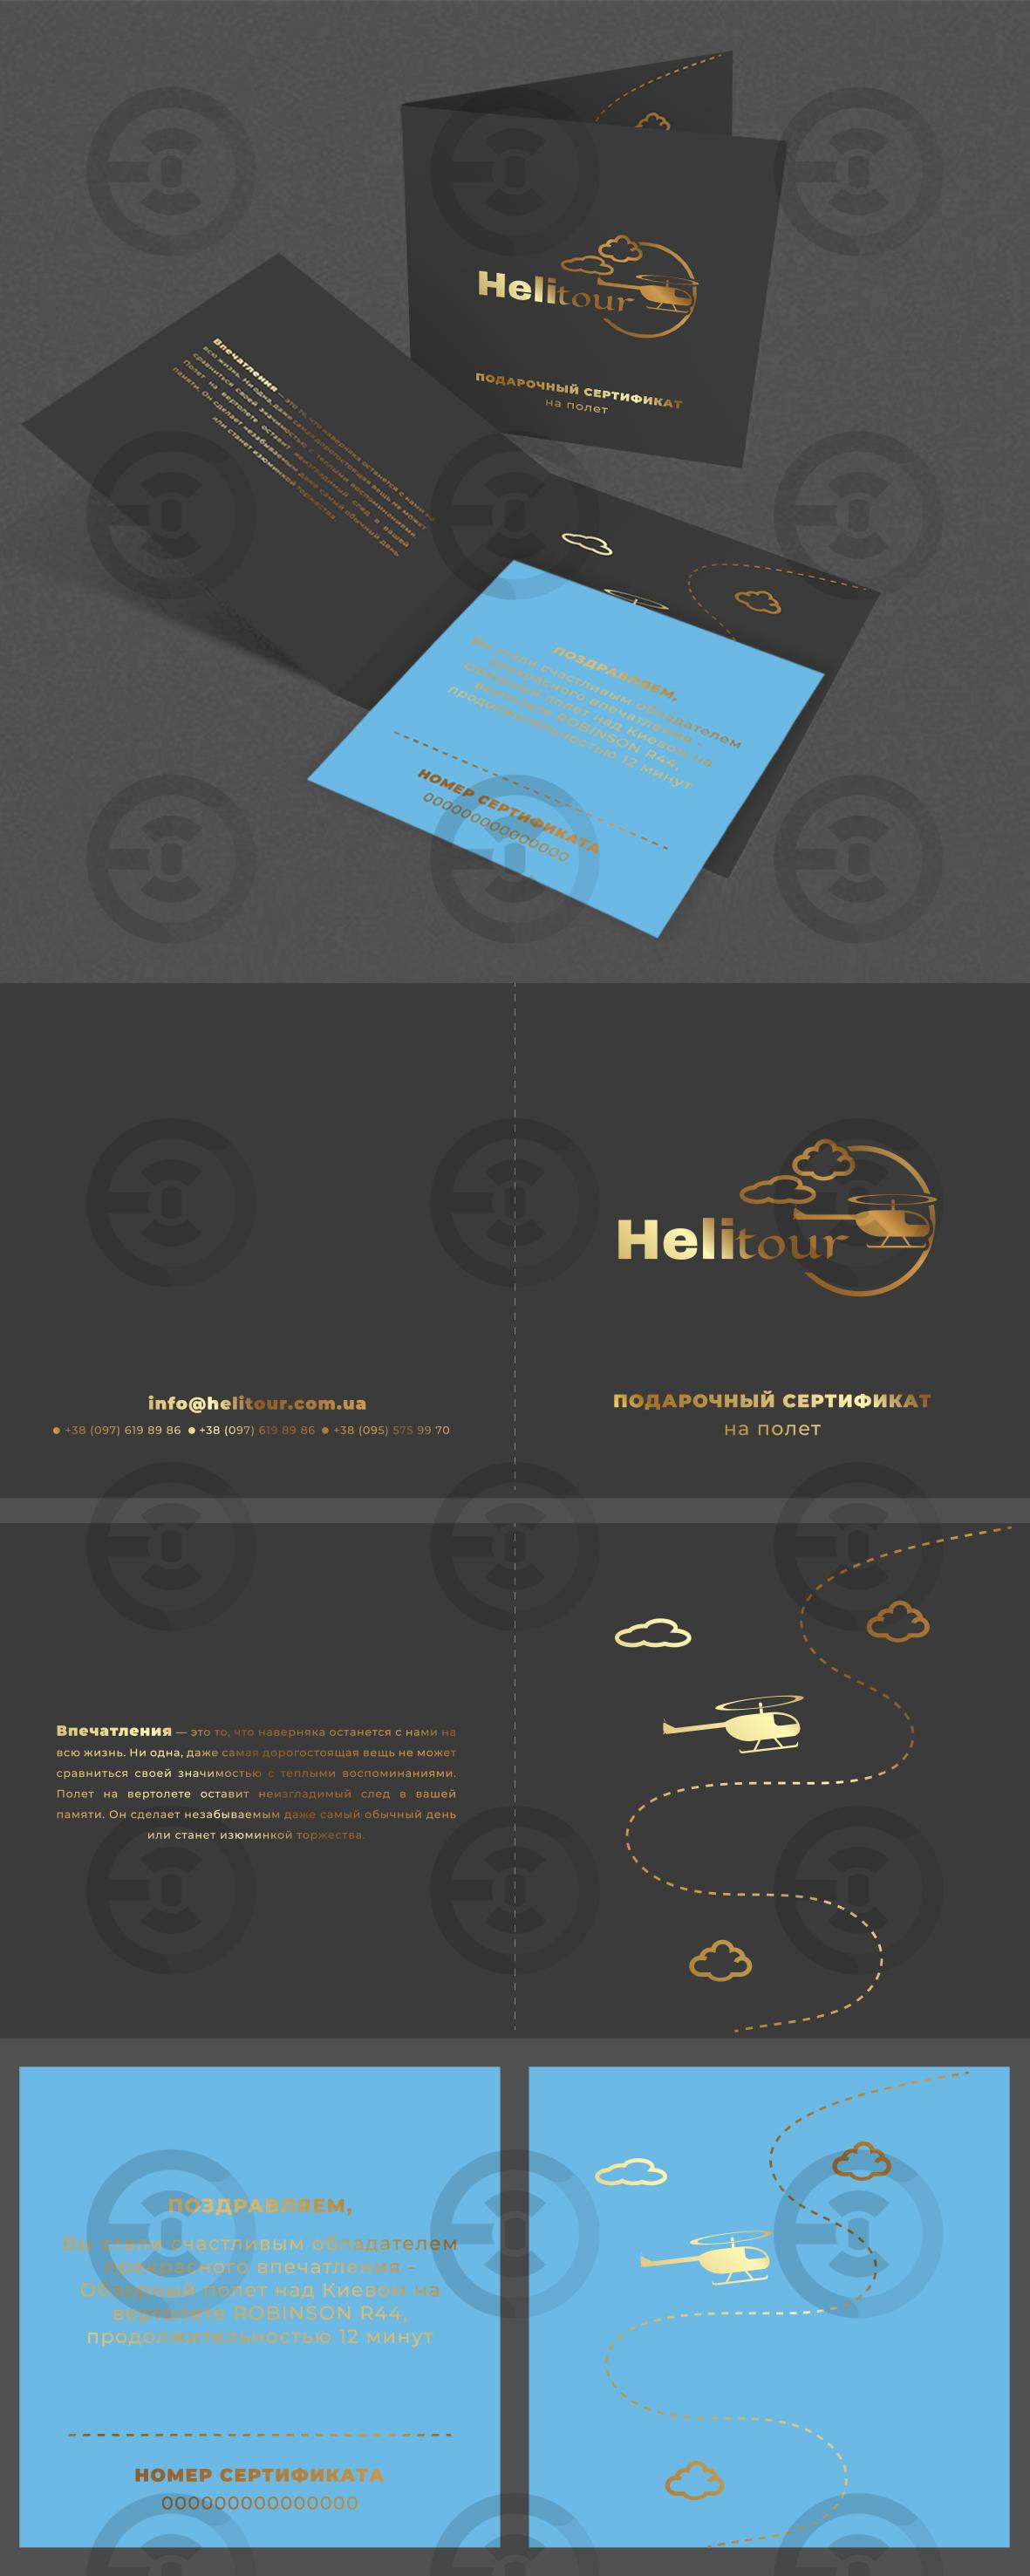 HeliTour_сертификат_gold.jpg